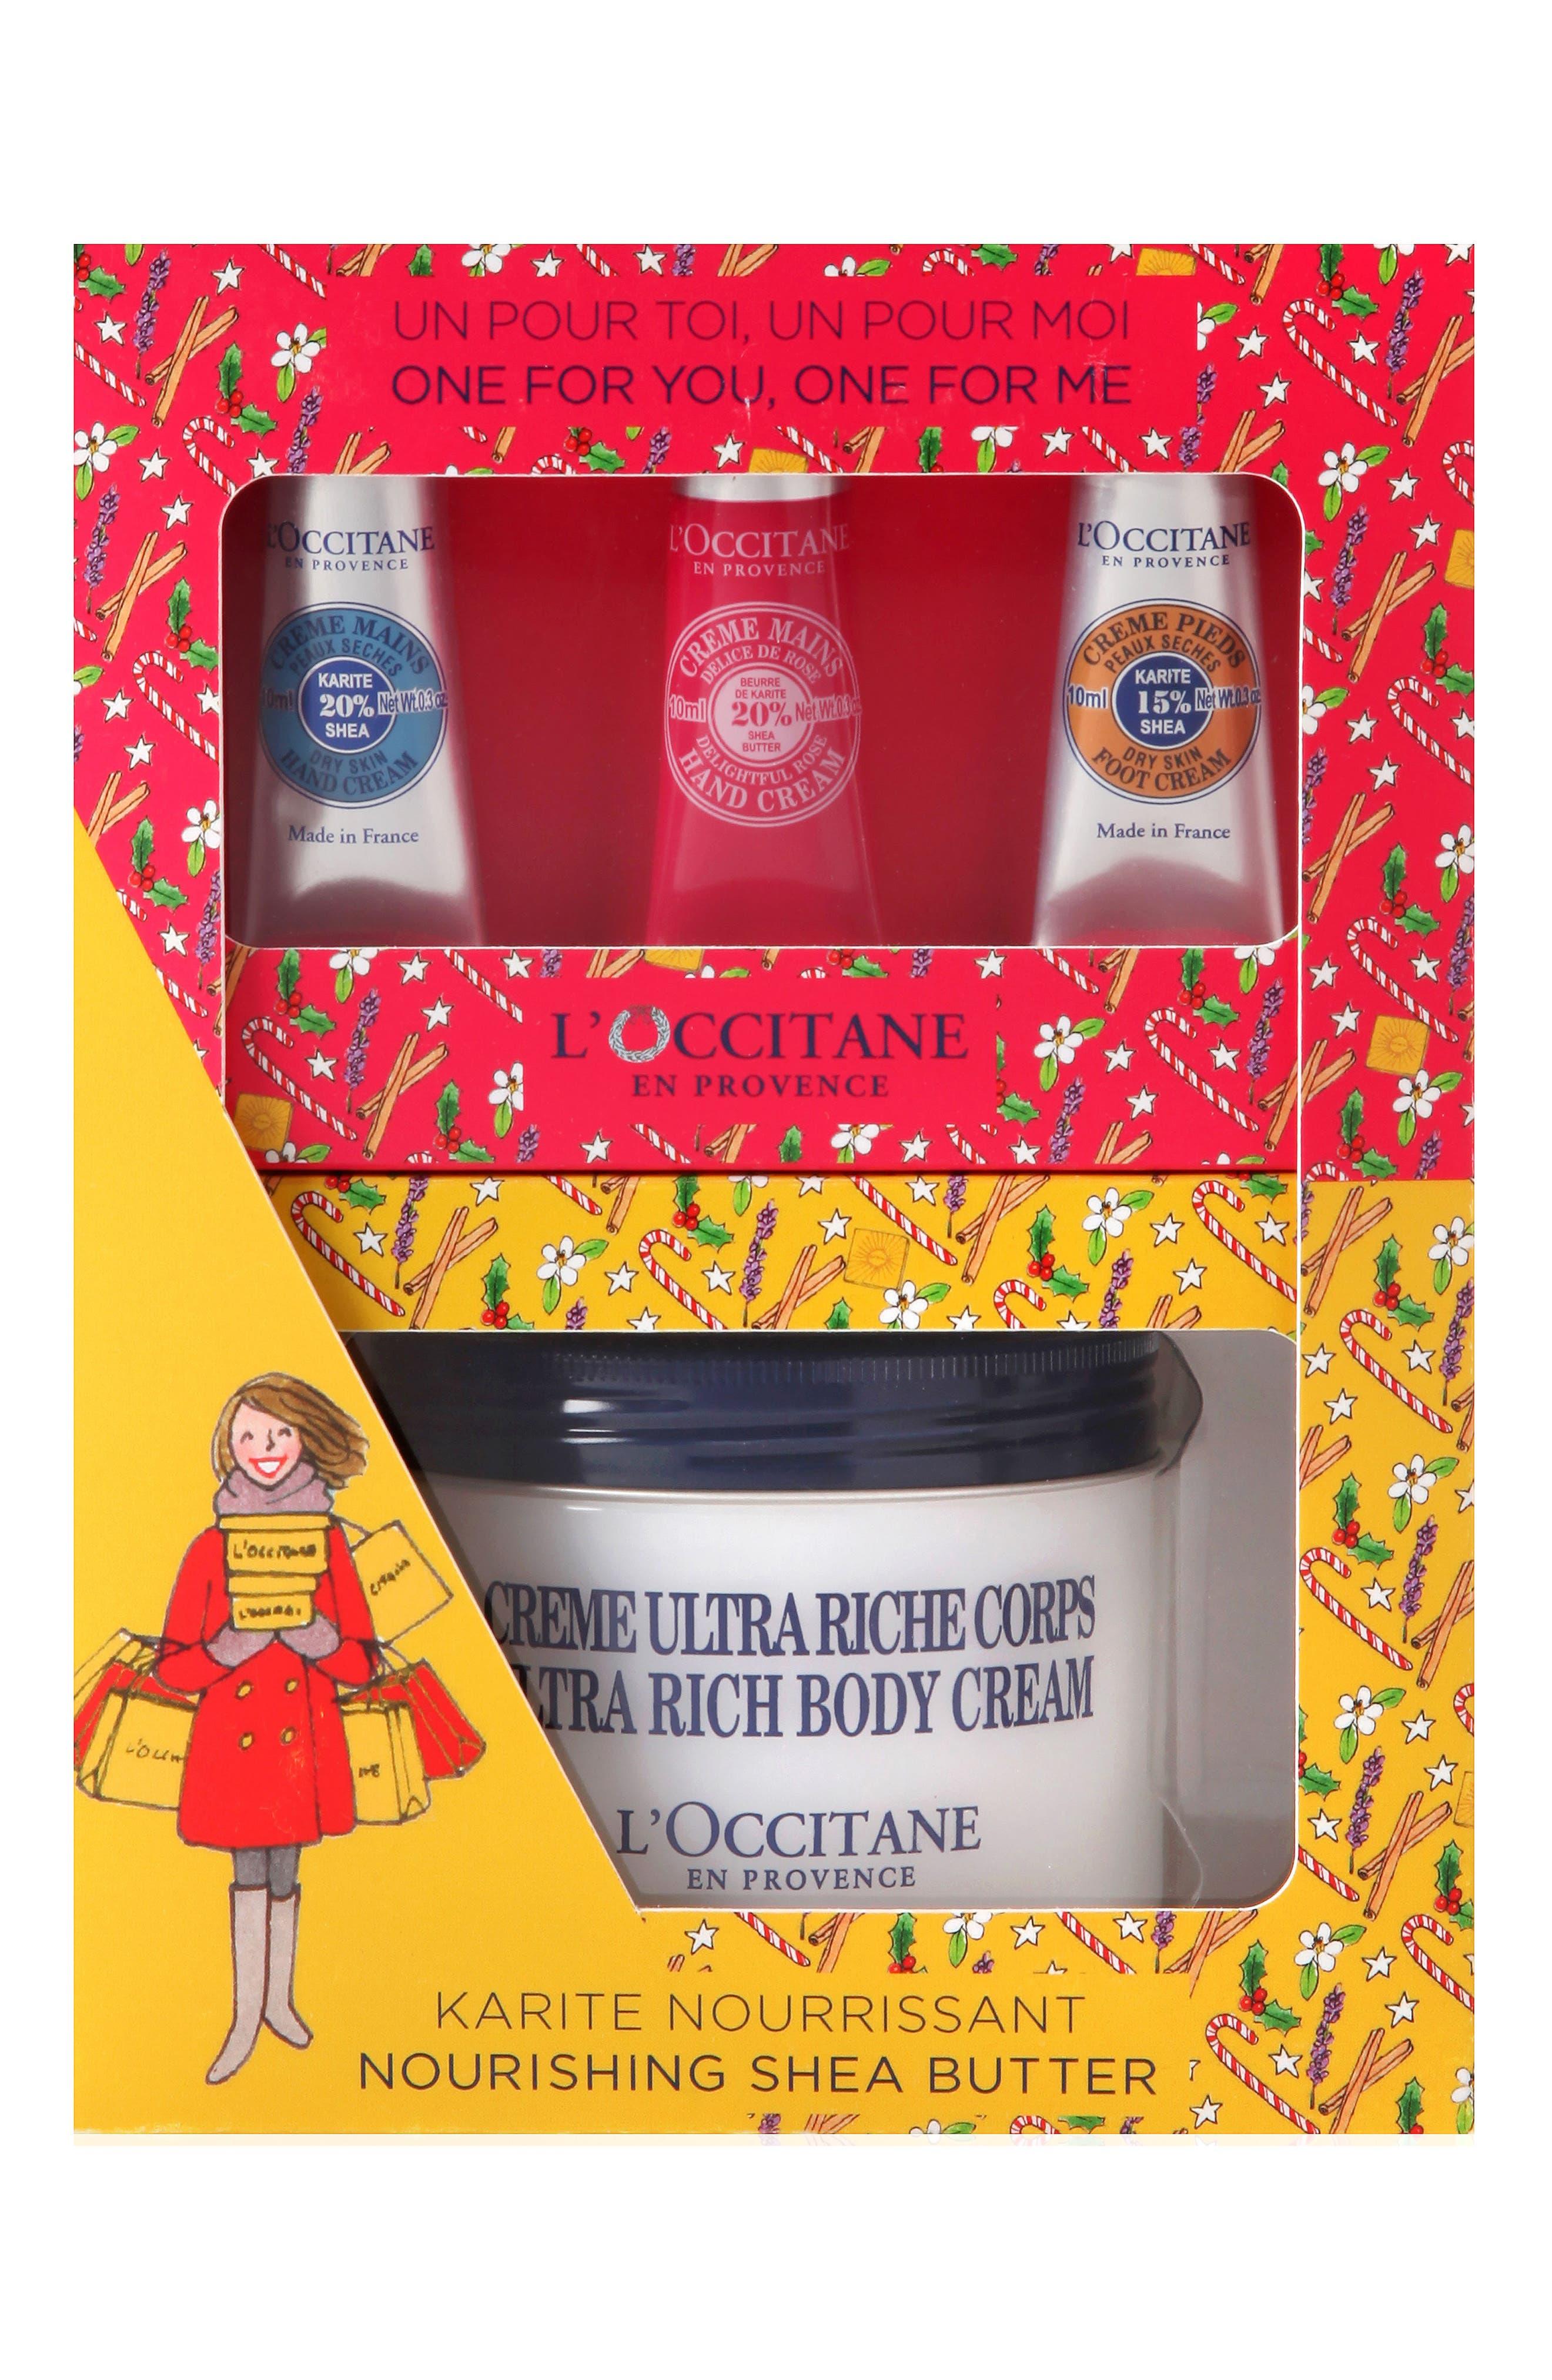 Alternate Image 1 Selected - L'Occitane Nourishing Shea Butter Set ($59 Value)